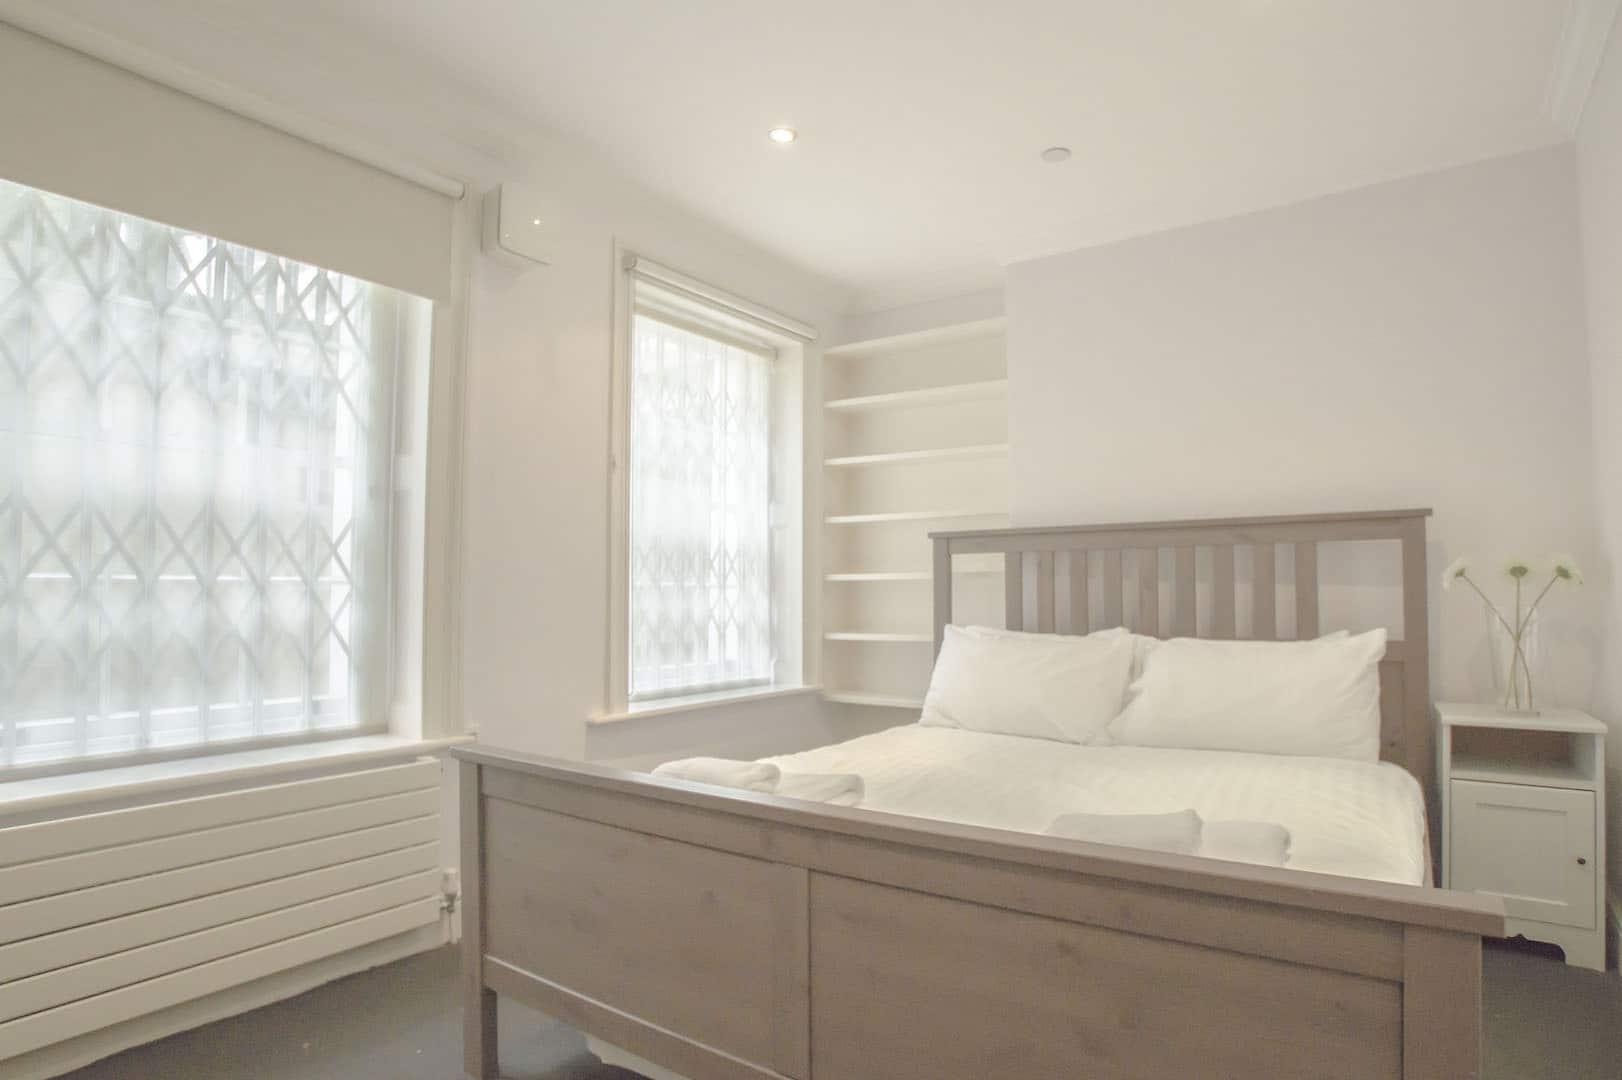 Se1 Apartment Photography, interior photography, lettings , rental photography, Airbnb photography